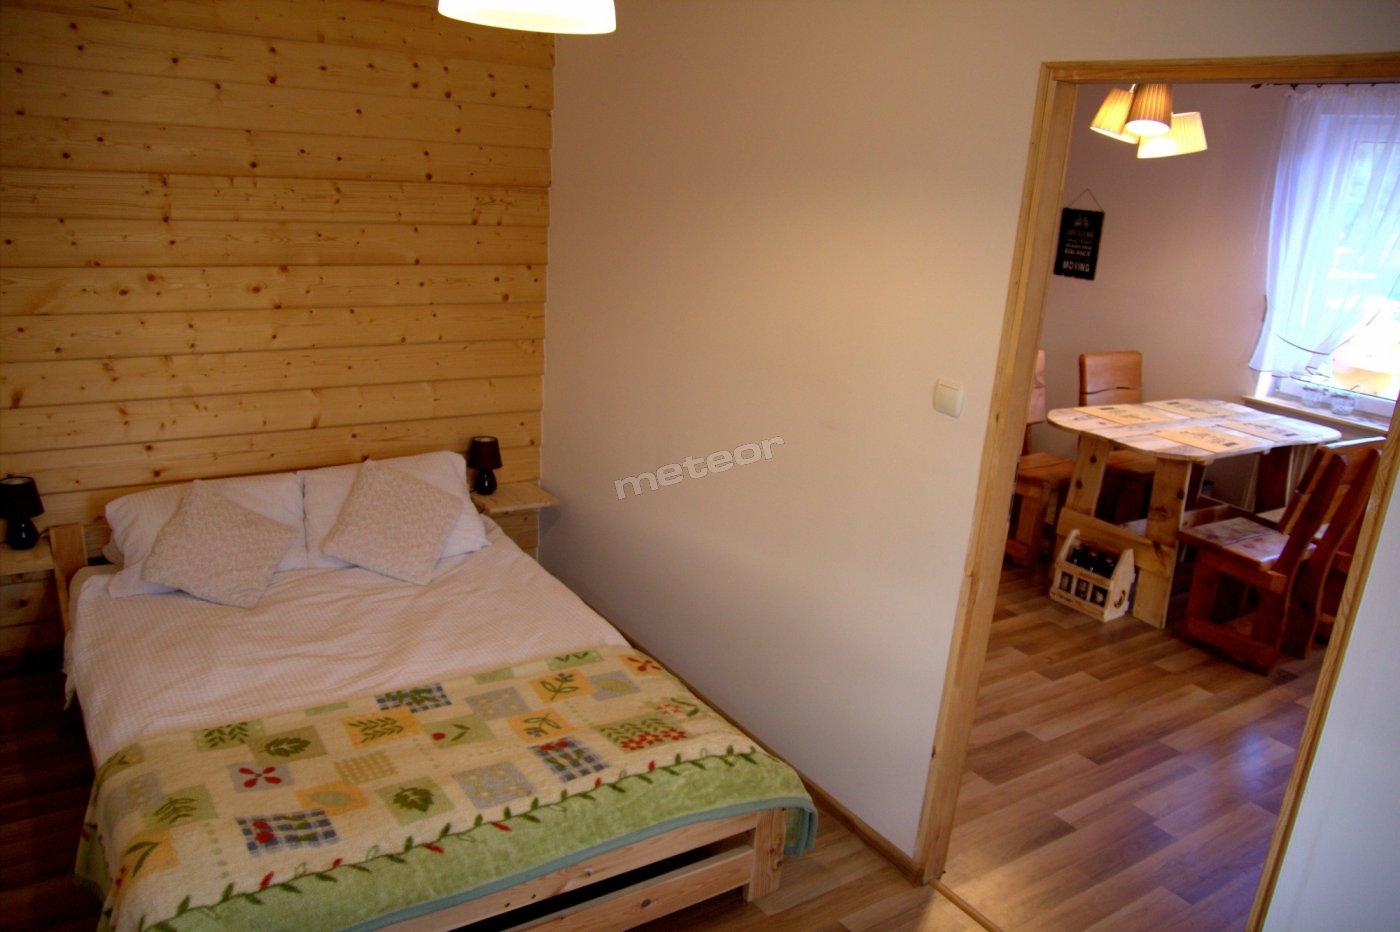 Apartament sosnowy- sypialnia